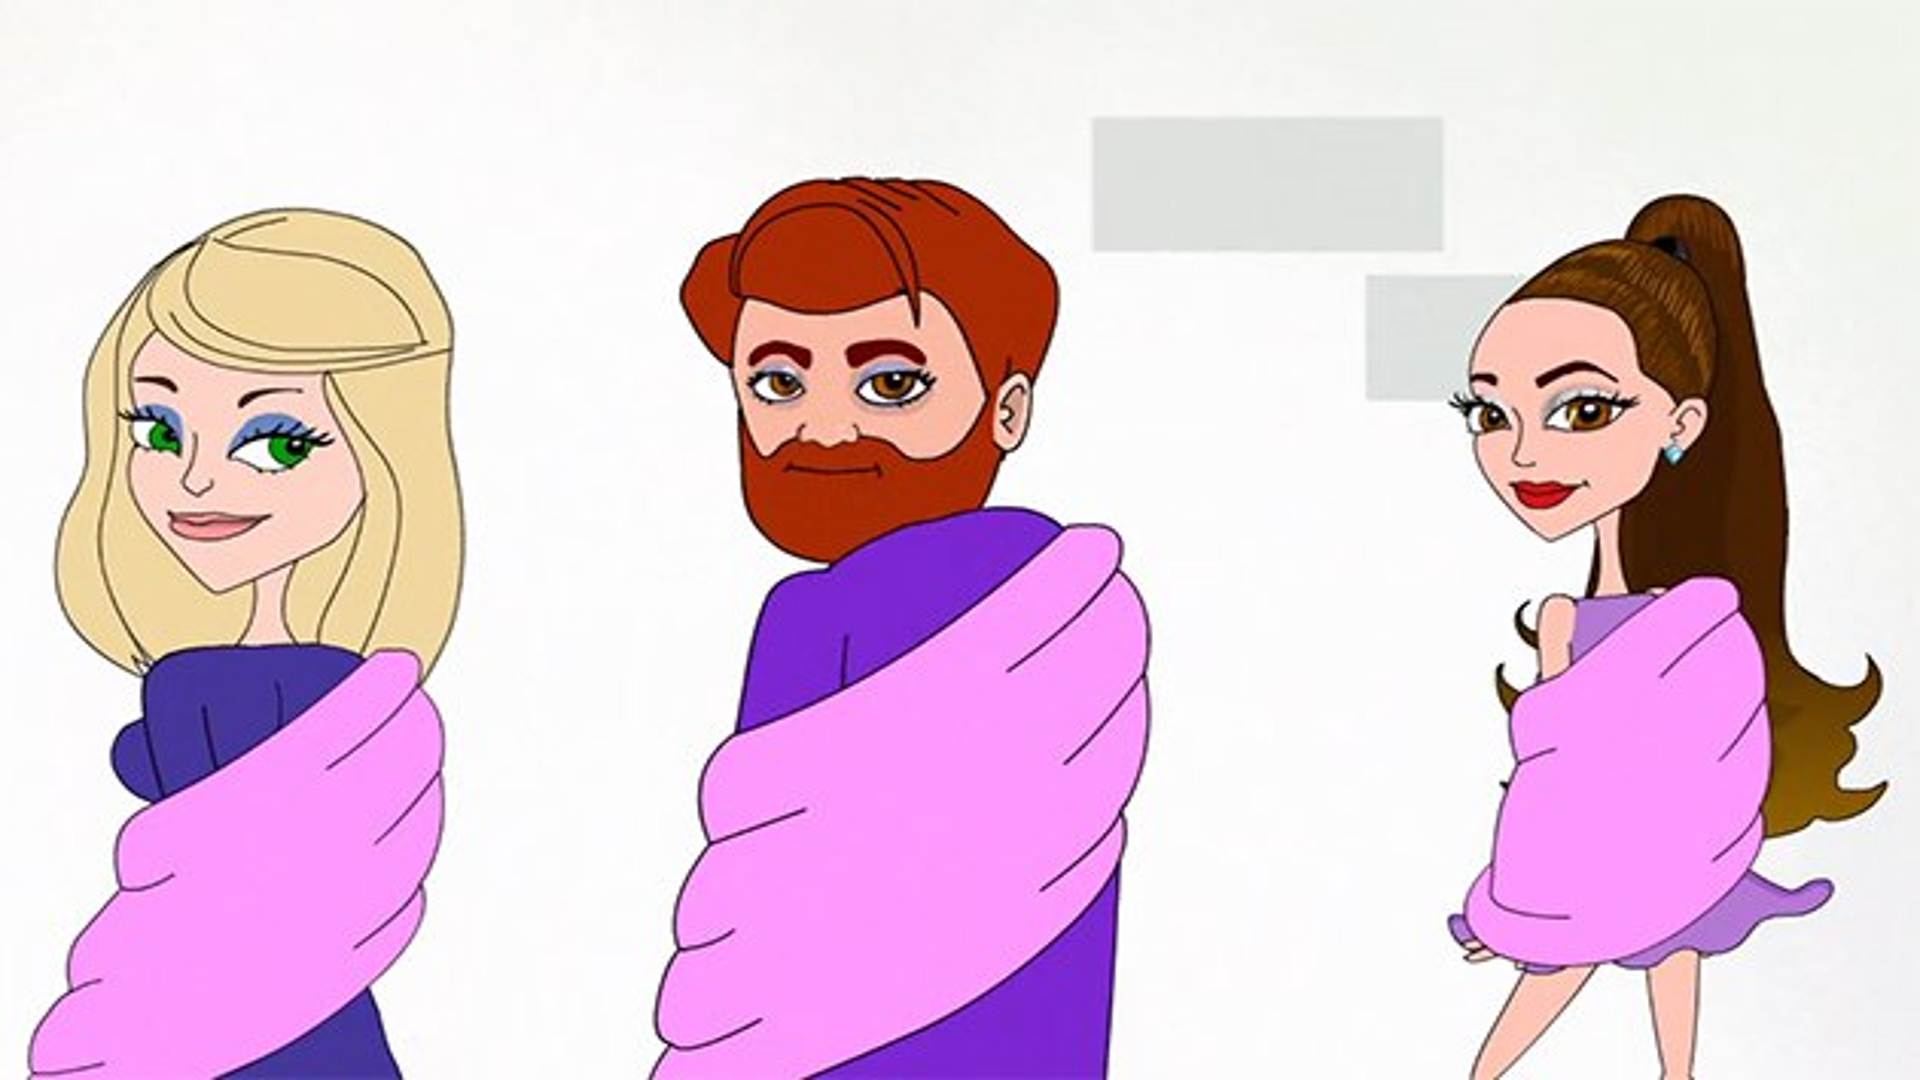 Meghan-Trainor-Ariana-Grande-Boys-Like-You-Musikvideo-Who-is-Fancy